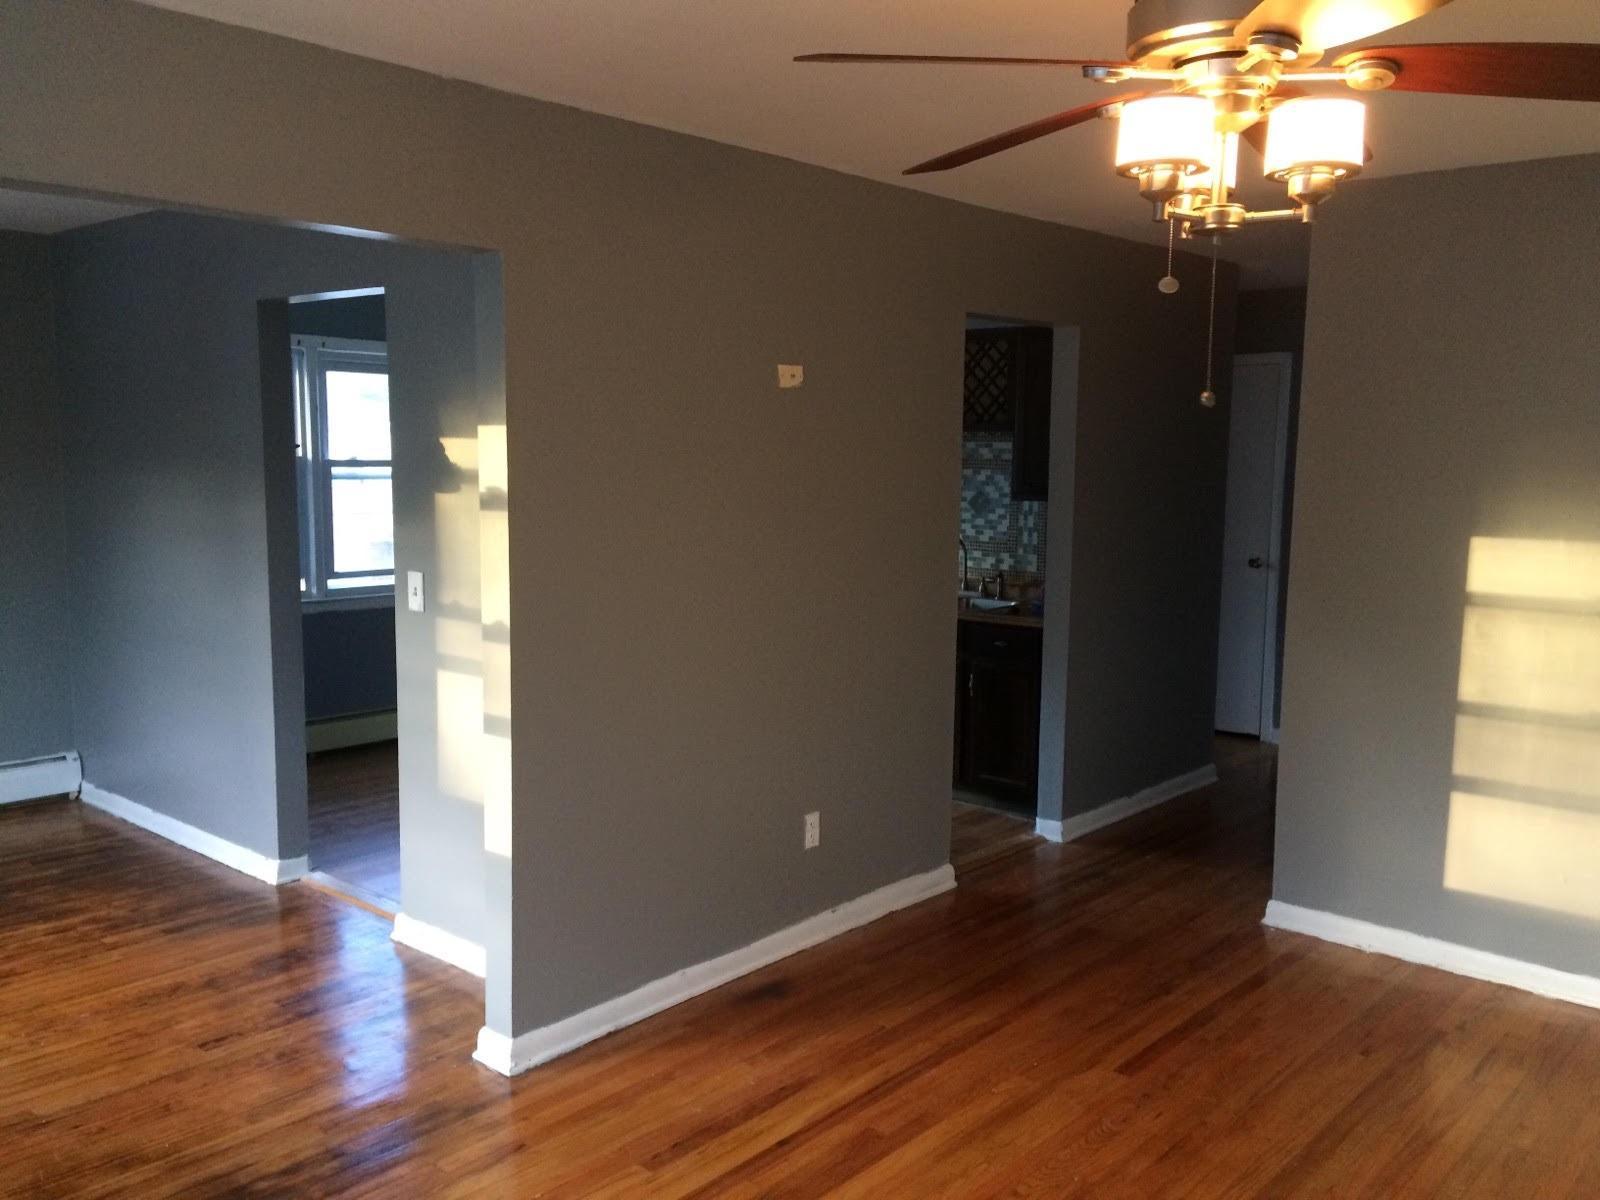 1009 Nora Dr, Linden, NJ 07036 For Rent | Trulia